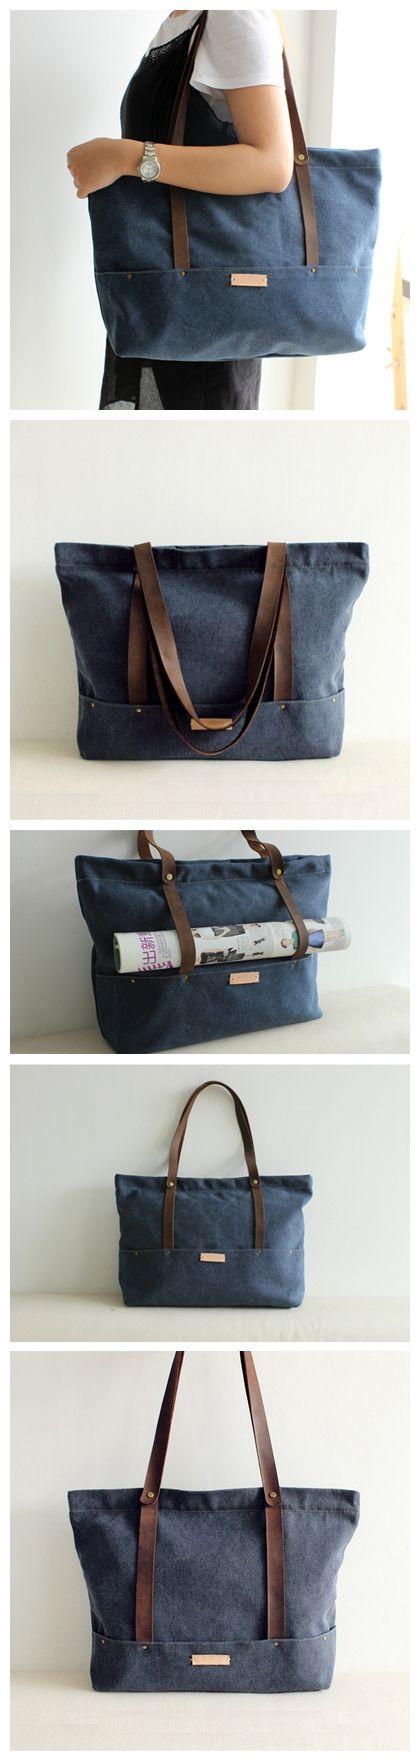 Handcrafted Waxed Canvas Tote Bag Diaper Bag Women's Fashion Handbag Shoulder Bag